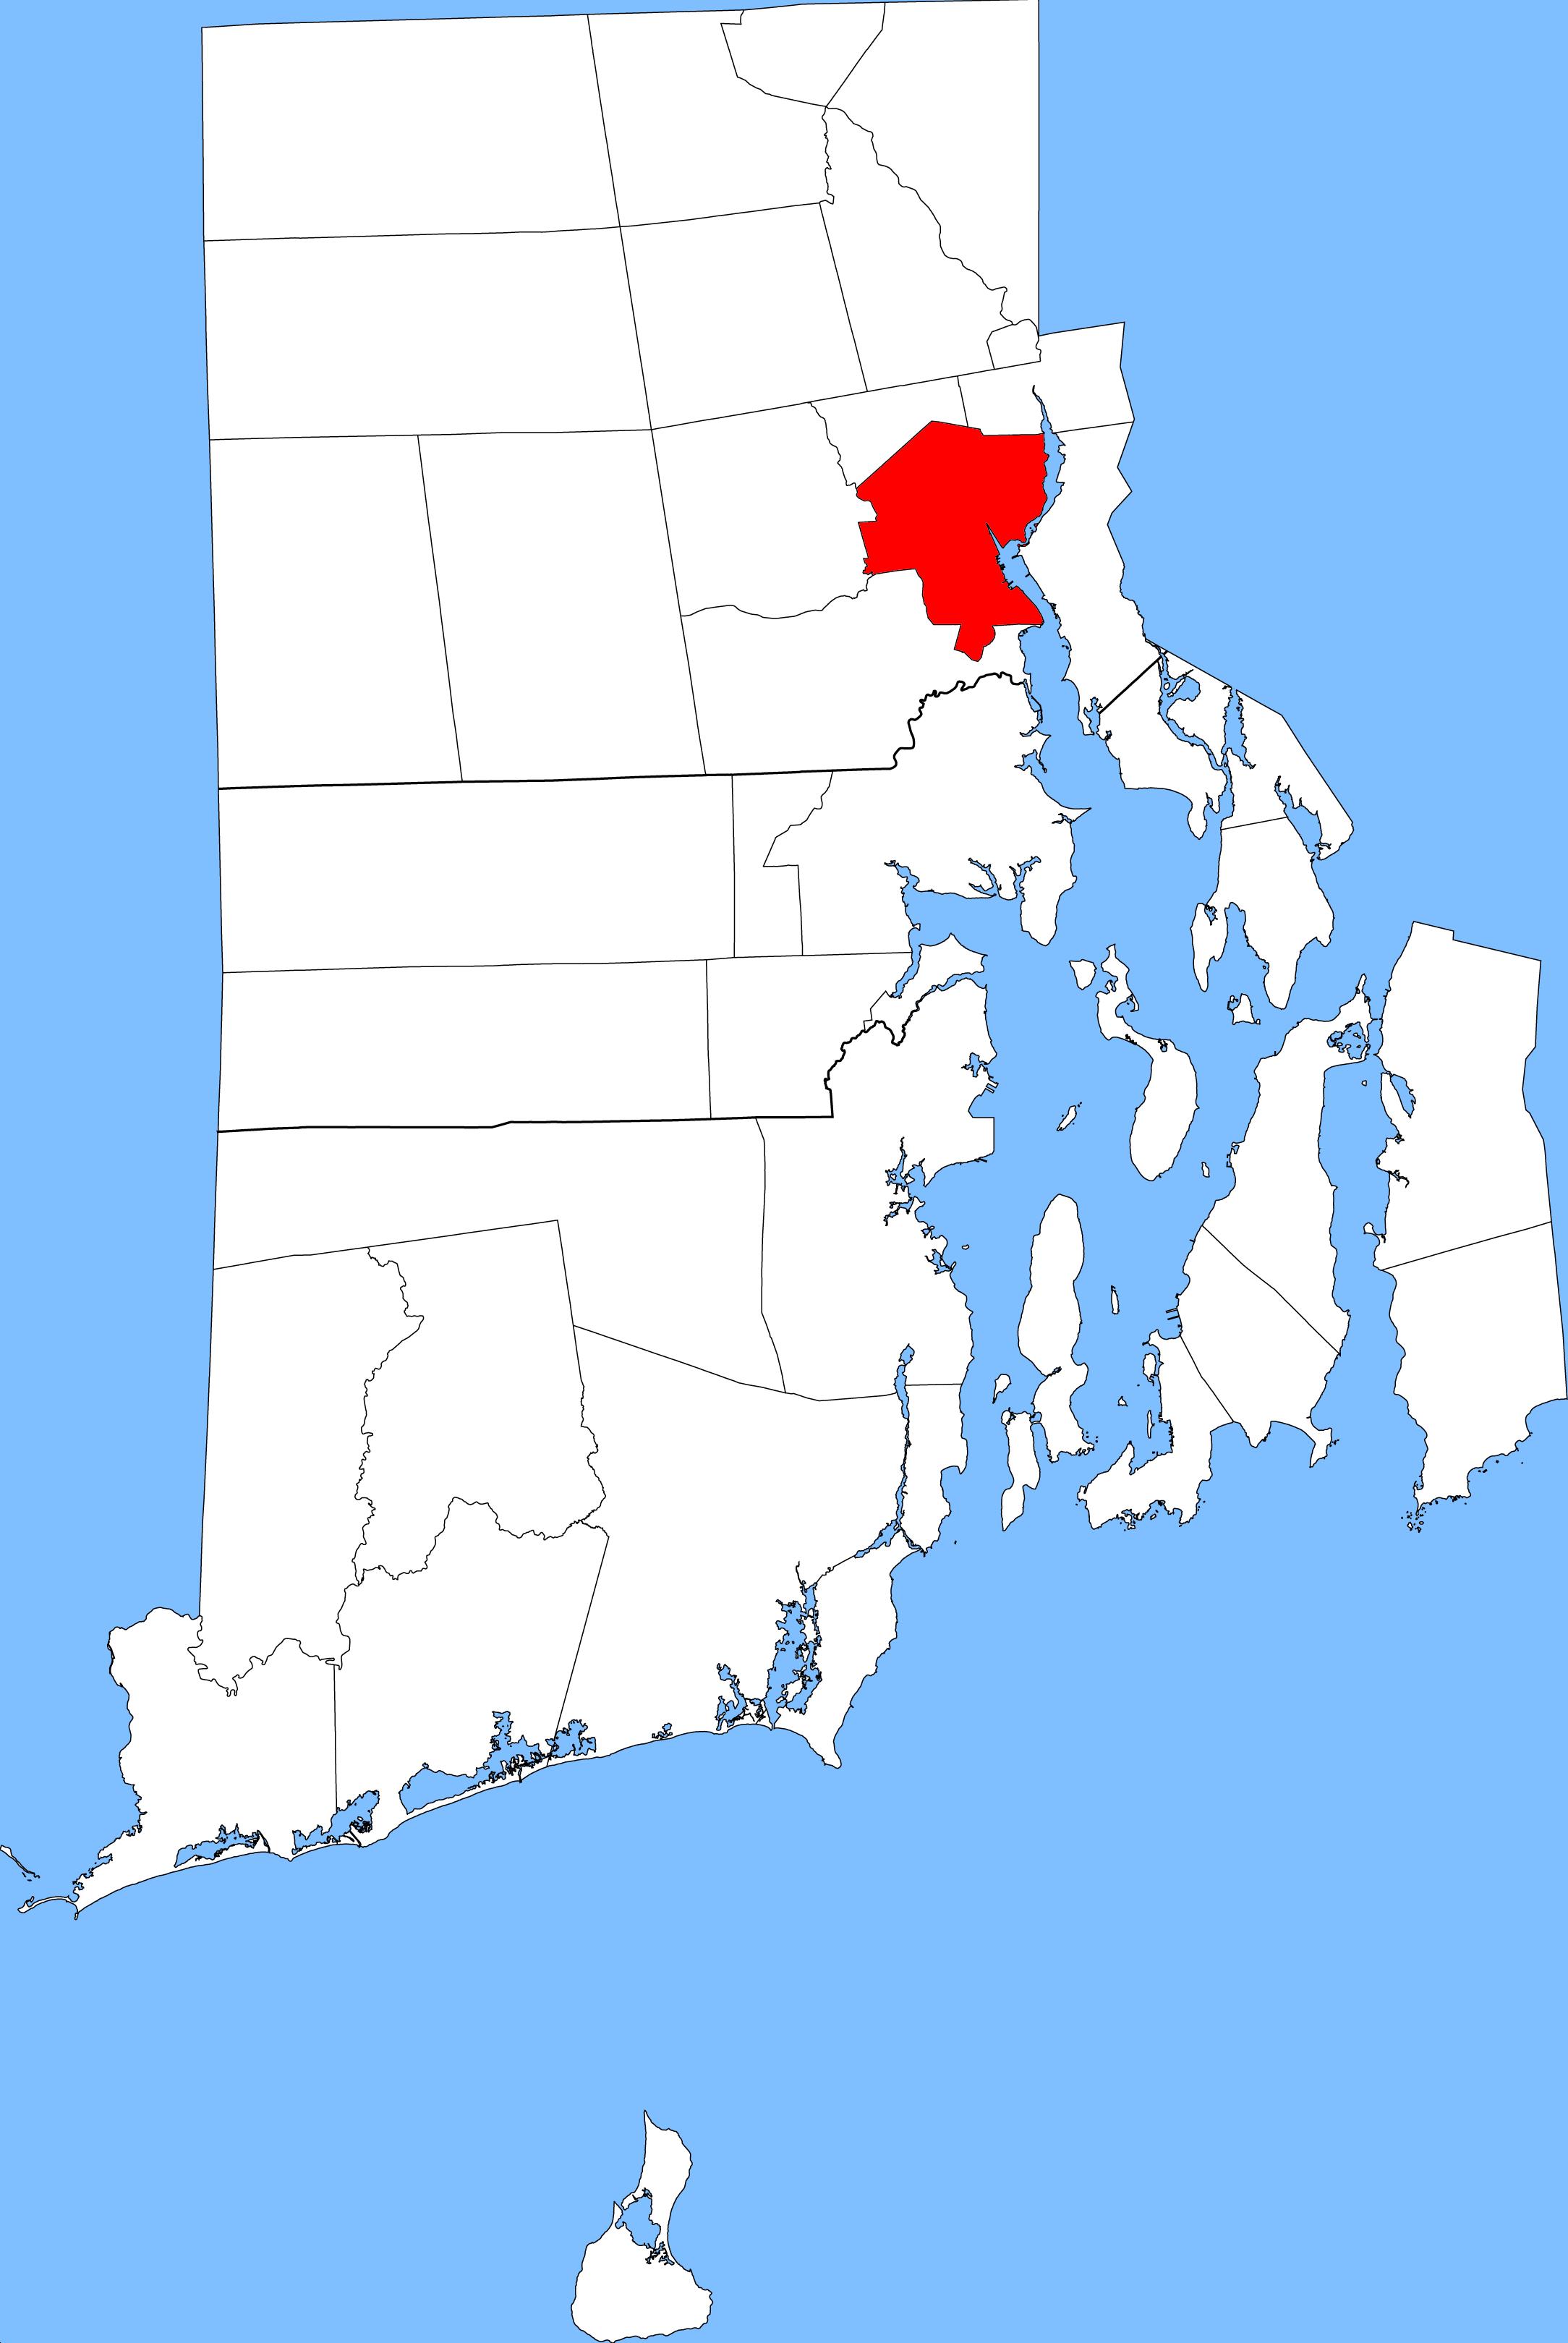 File:RIMap-doton-Providence.PNG - Wikimedia Commons